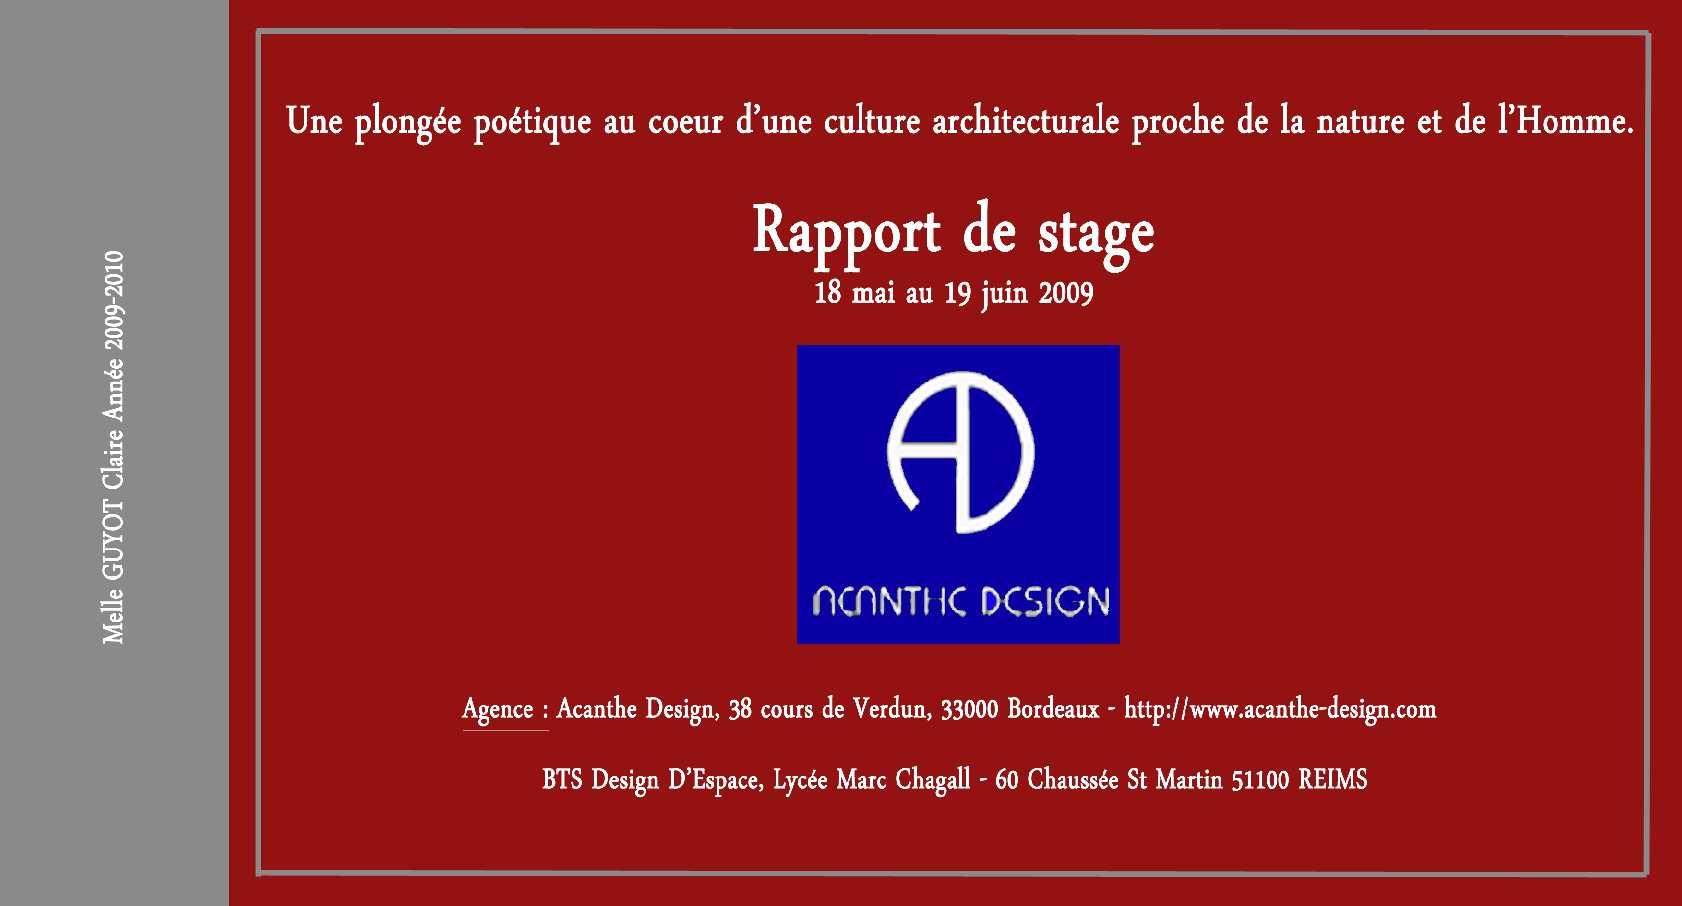 Calaméo Rapport De Stage 2009